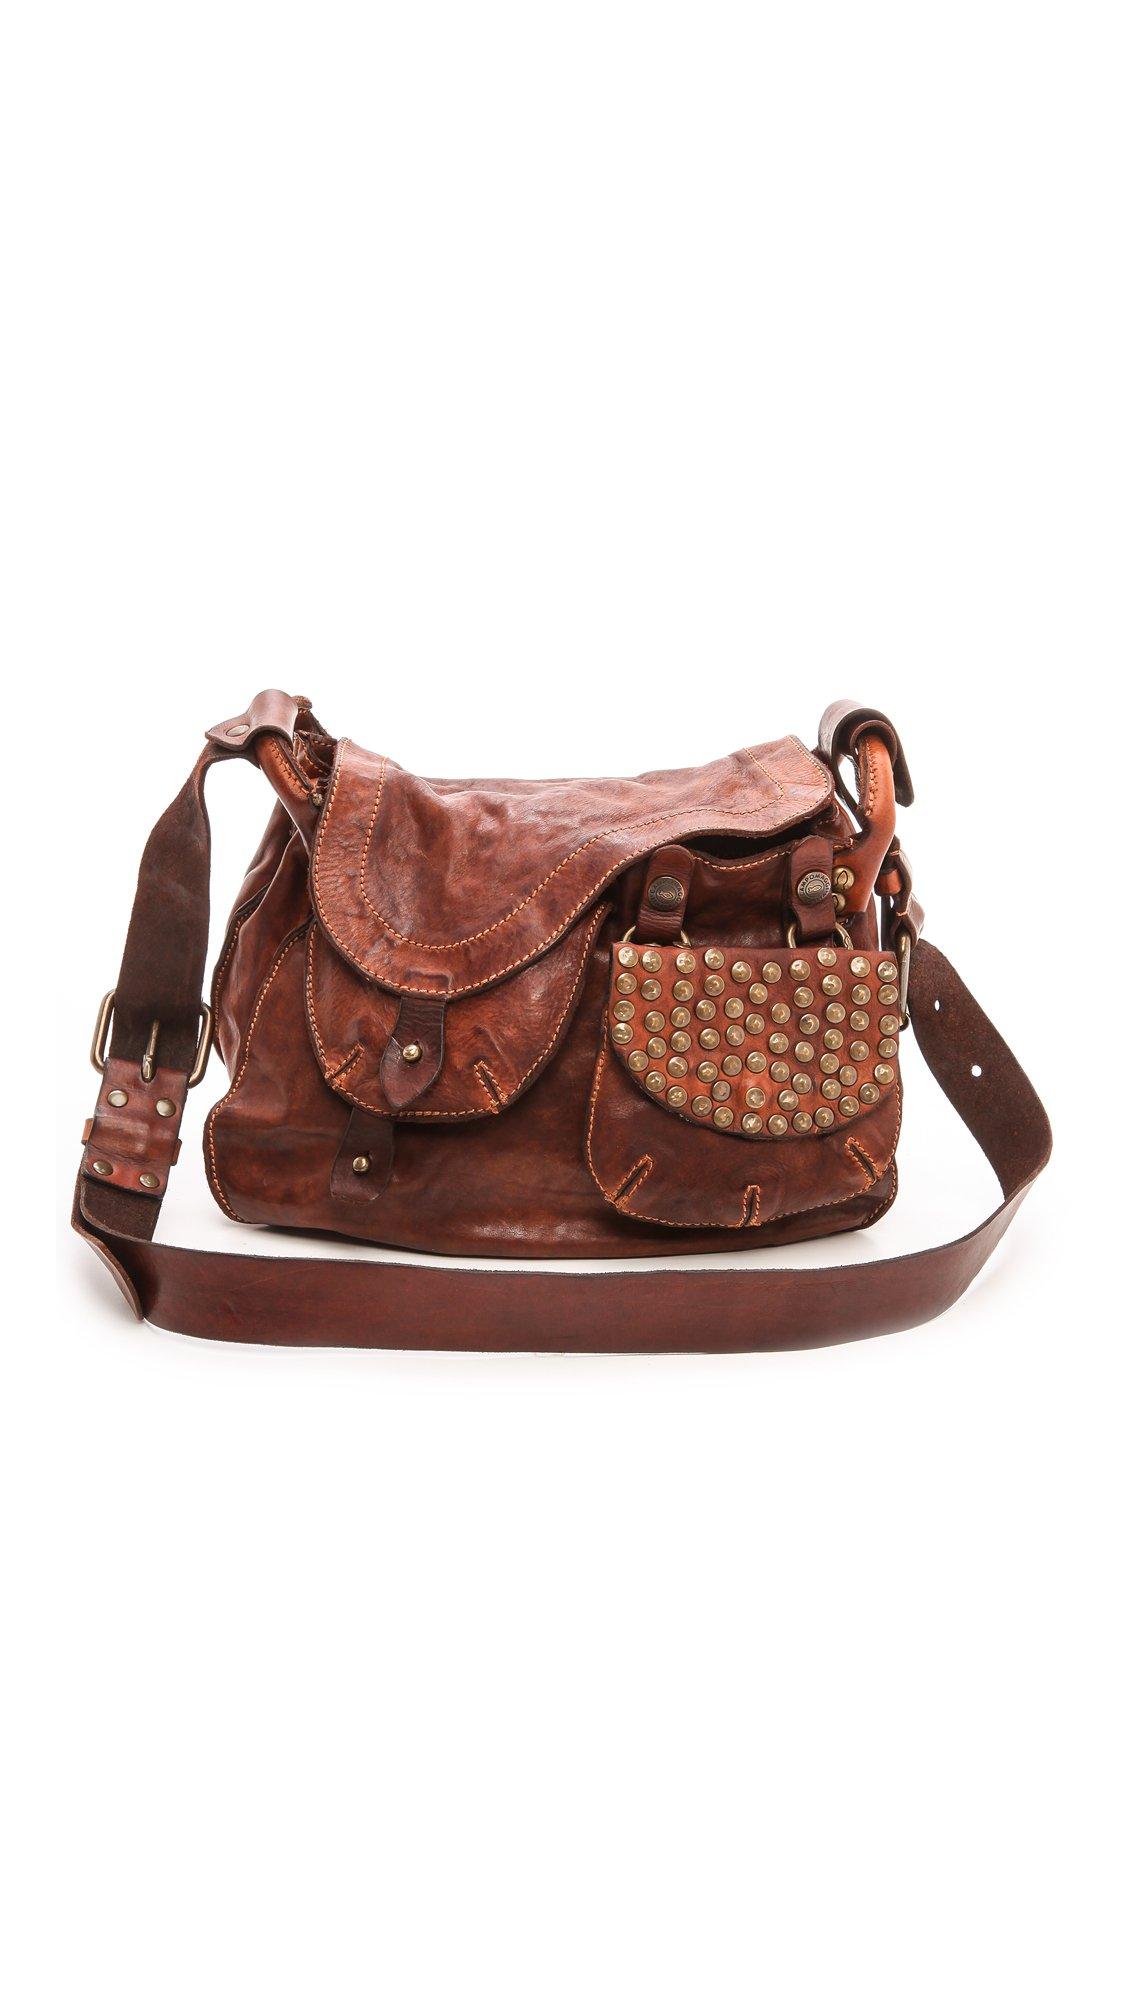 Womens Micro Leather Crossbody Bag Campomaggi pRKTocdGUb